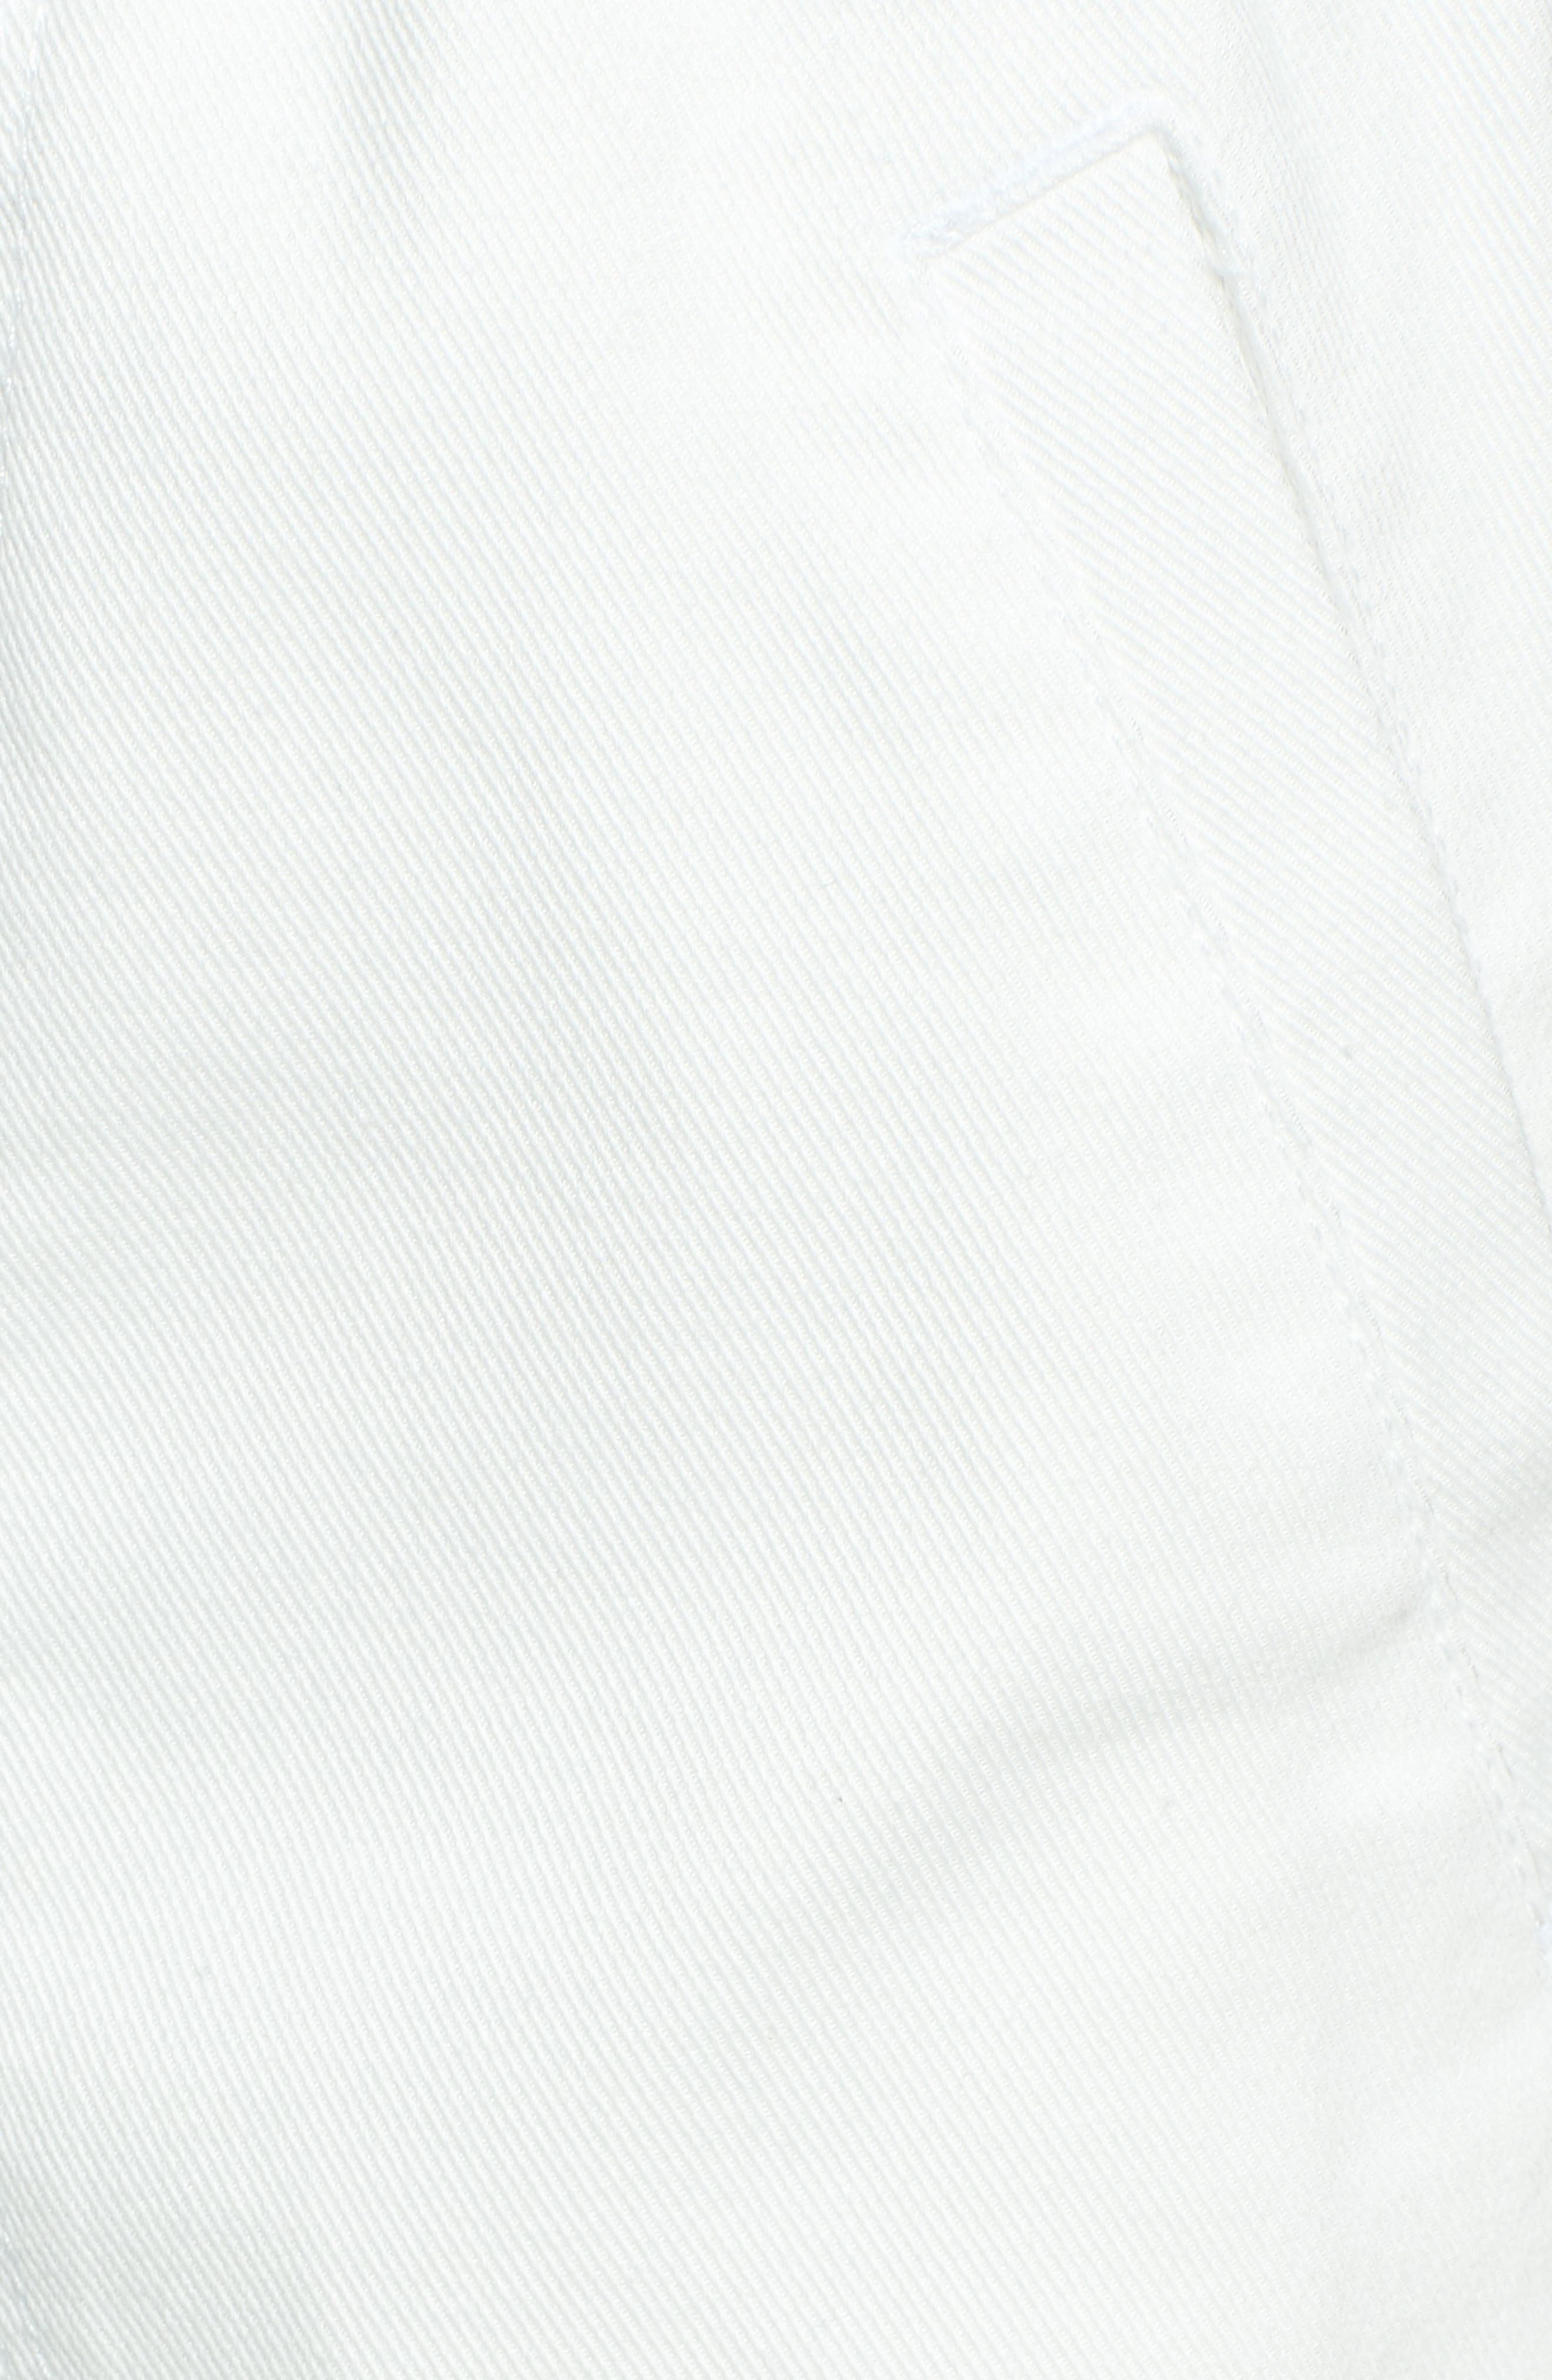 Open Road Drawstring Shorts,                             Alternate thumbnail 5, color,                             123